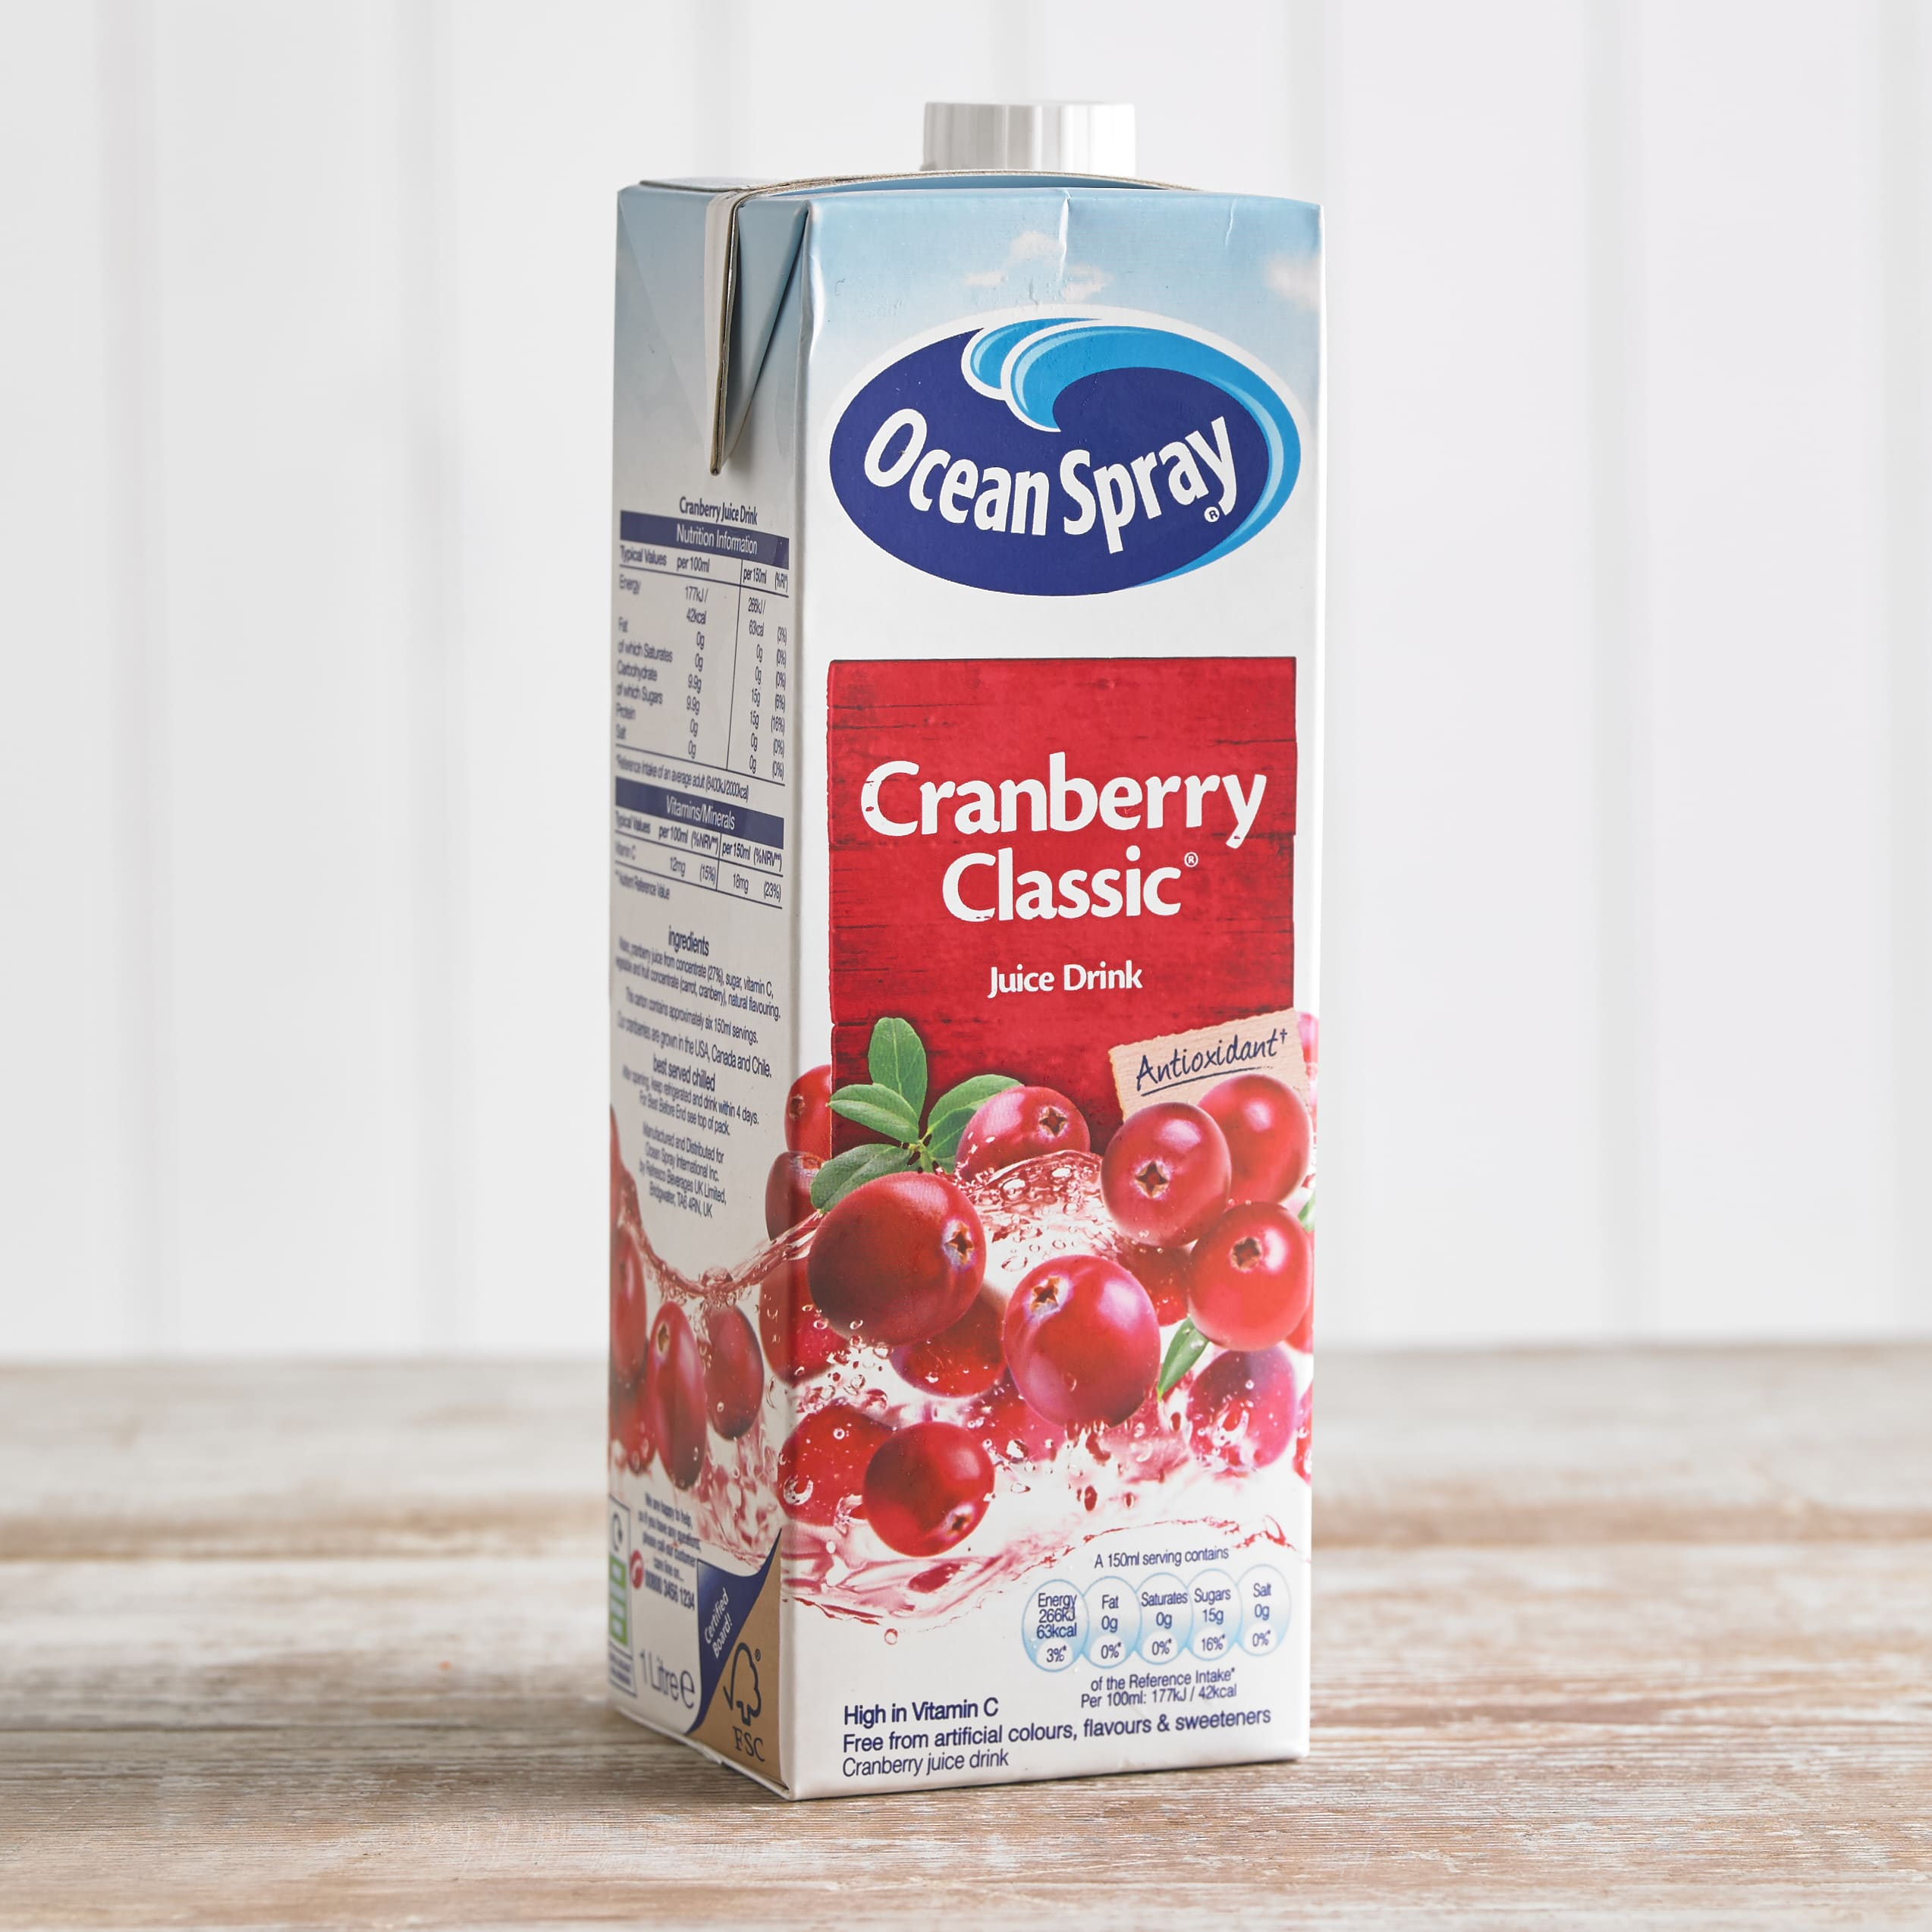 Ocean Spray Cranberry Classic Juice Drink, 1L